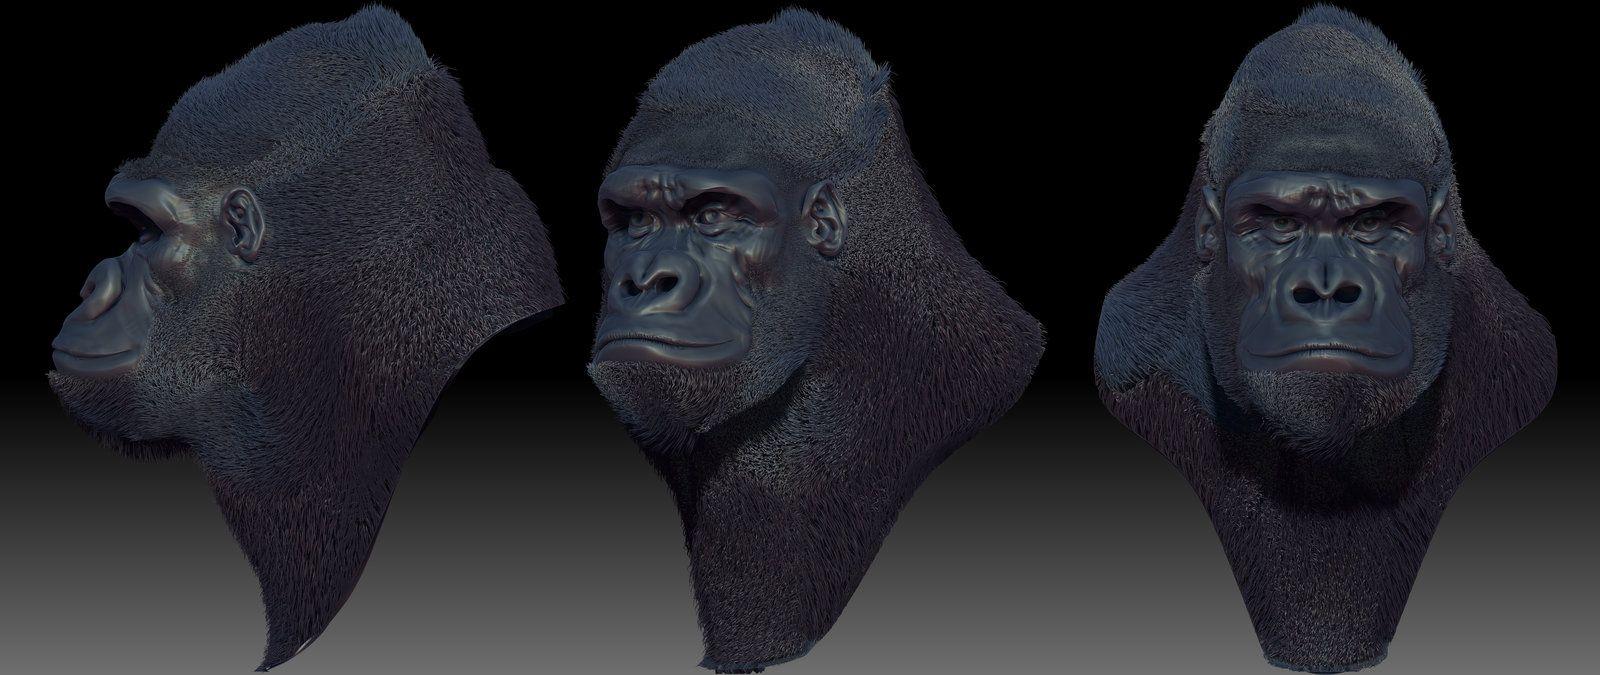 gorilla_speed_sculpt_by_gvdigitalsculptor-d62nn4a.jpg (1600×675 ...